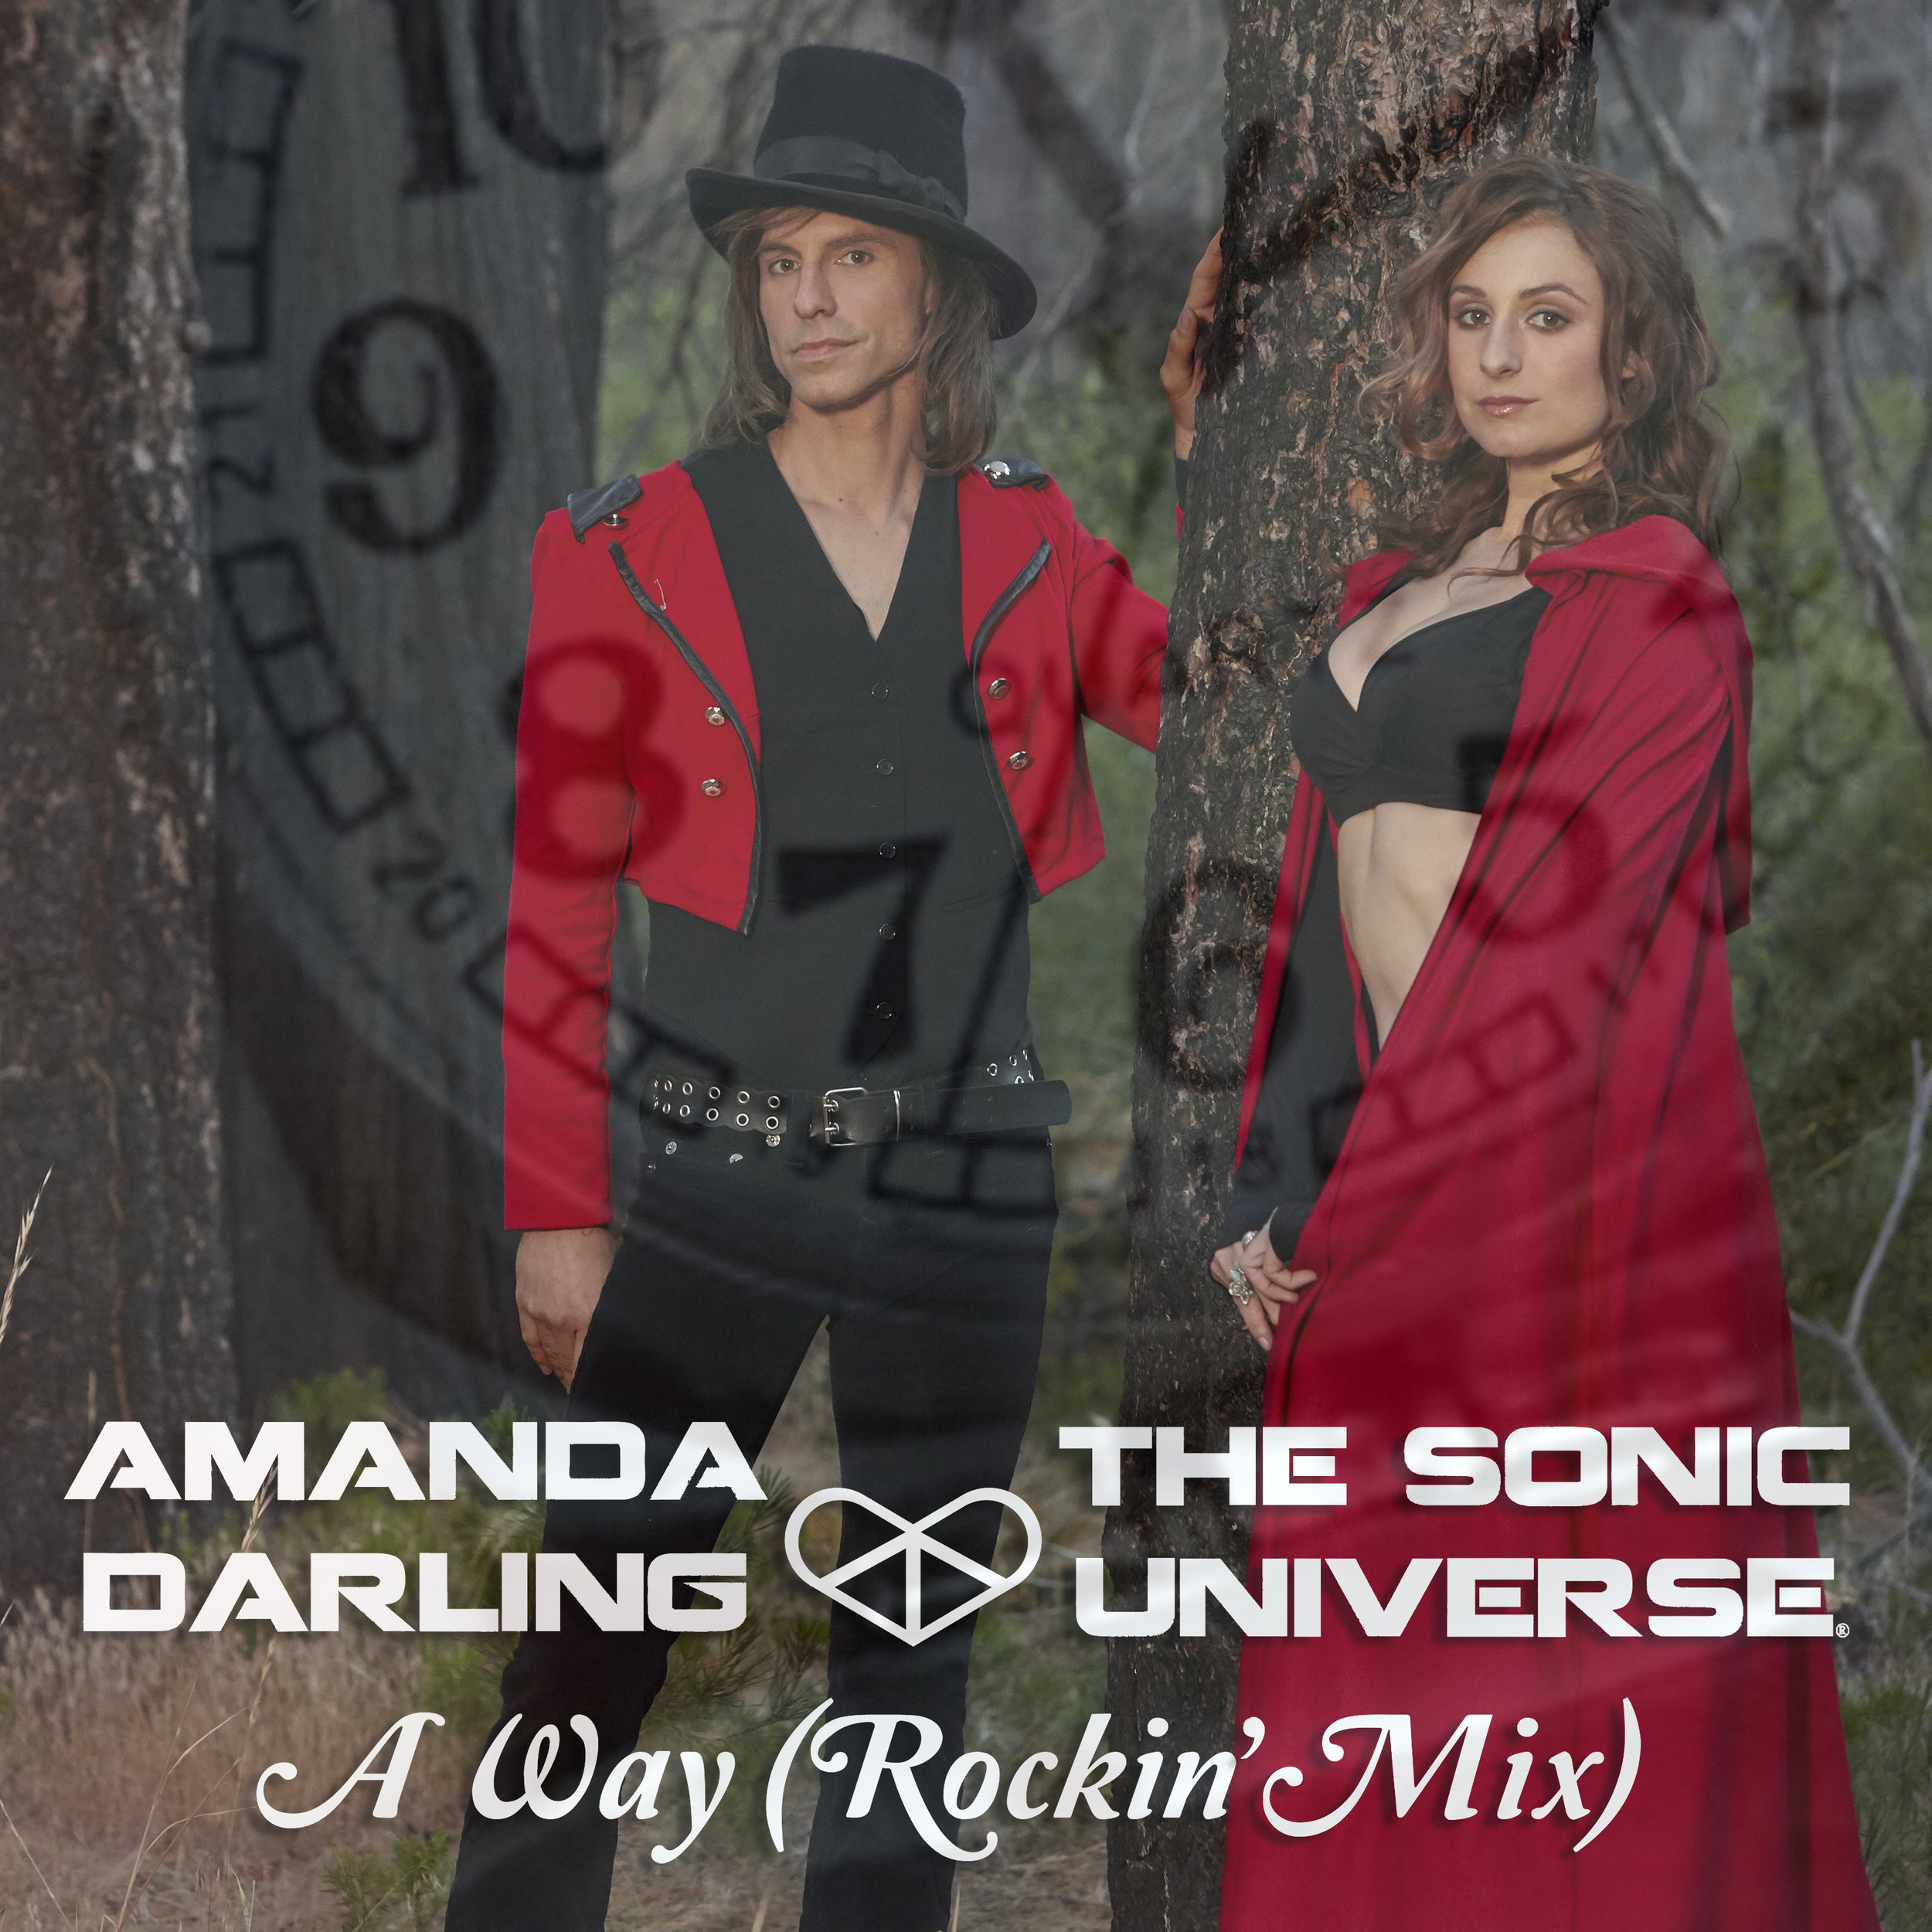 Amanda Darling, The Sonic Universe - A Way (Rockin' Mix) album cover Beatport release